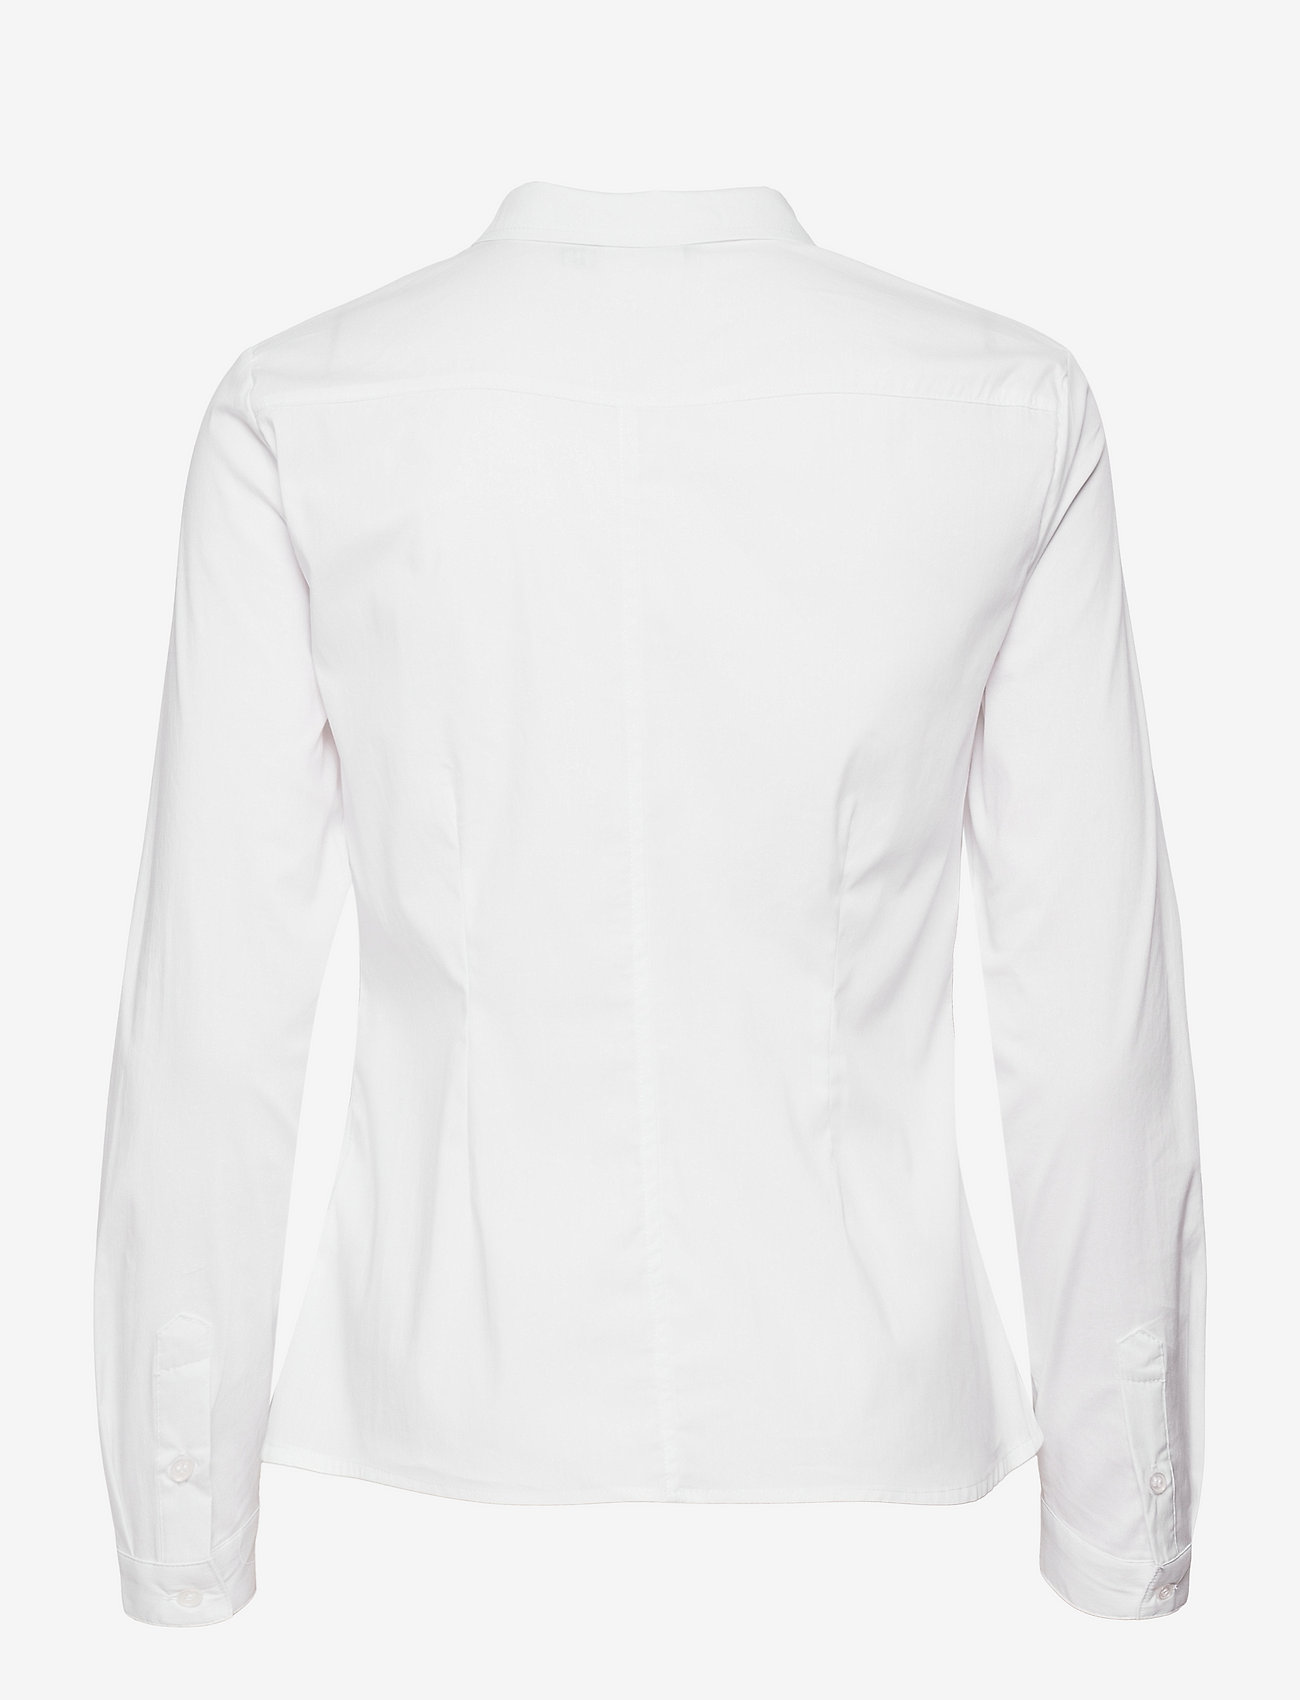 ICHI - IHDIMA SH - long-sleeved shirts - white - 1